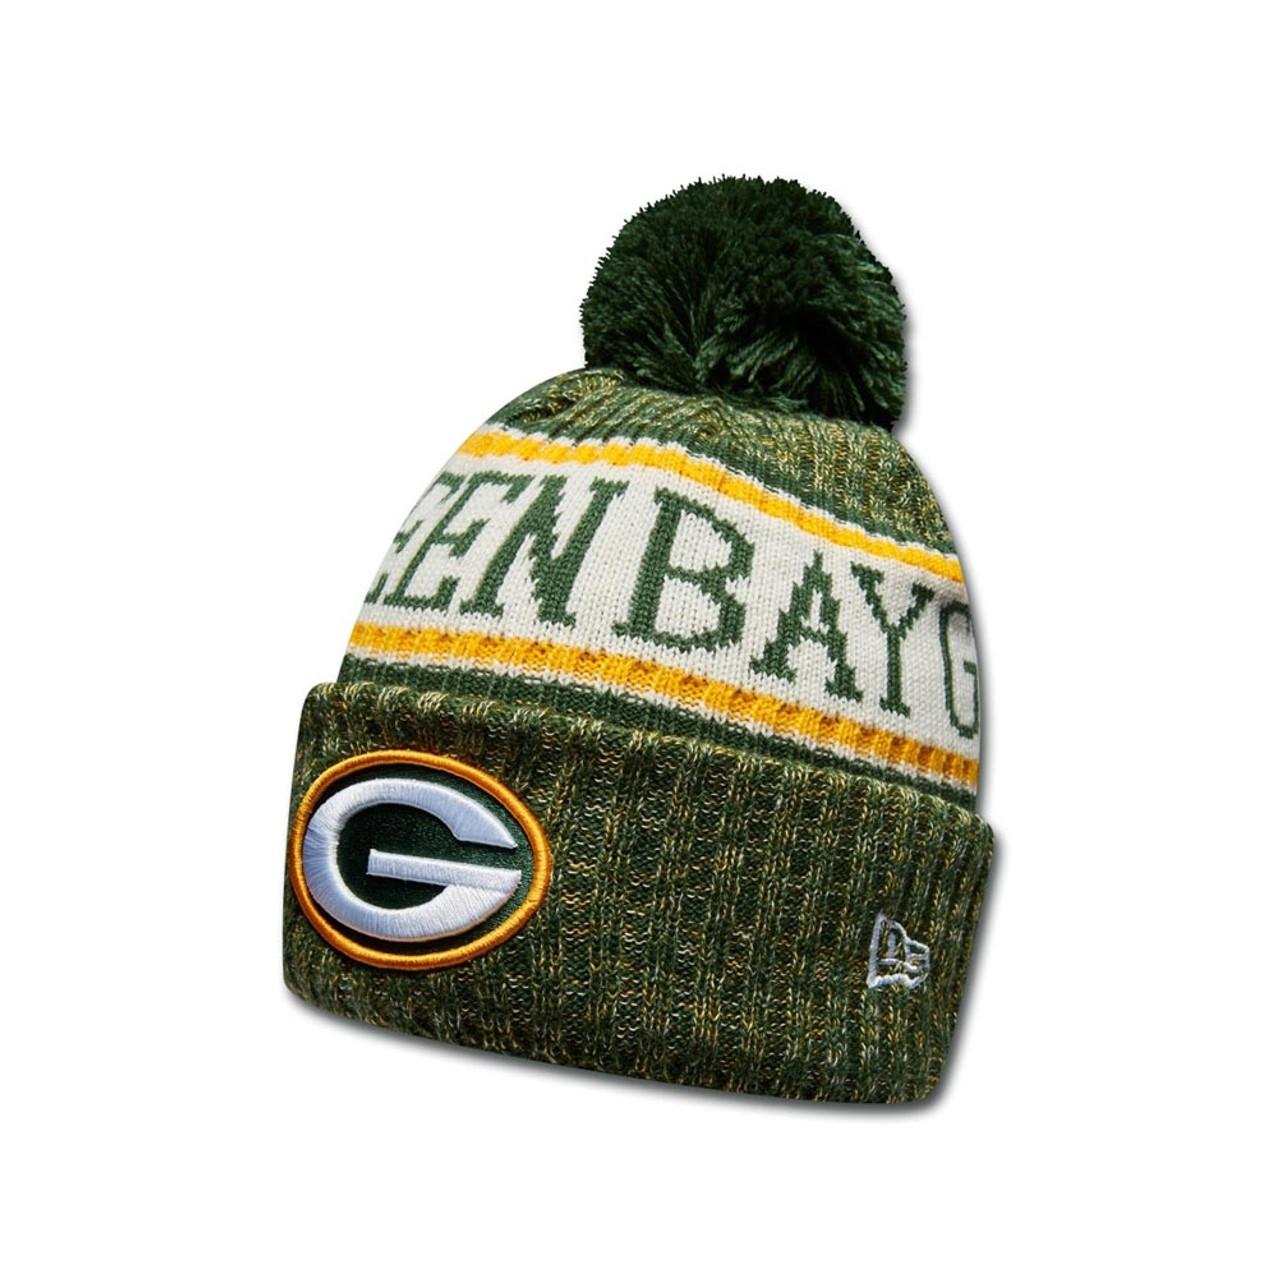 77ae3aa7edb3e NEW ERA Green Bay Packers NFL sideline knit bobble beanie hat ...